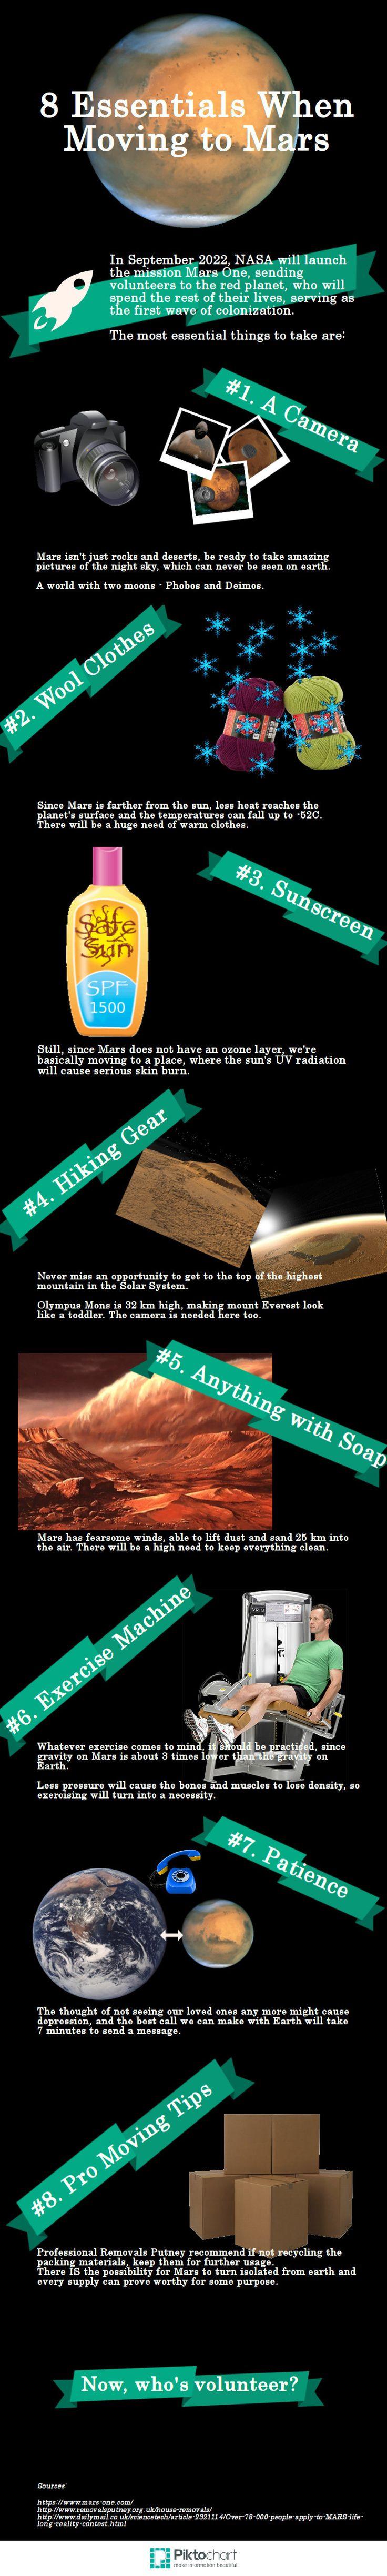 visuals to mars mission - photo #20